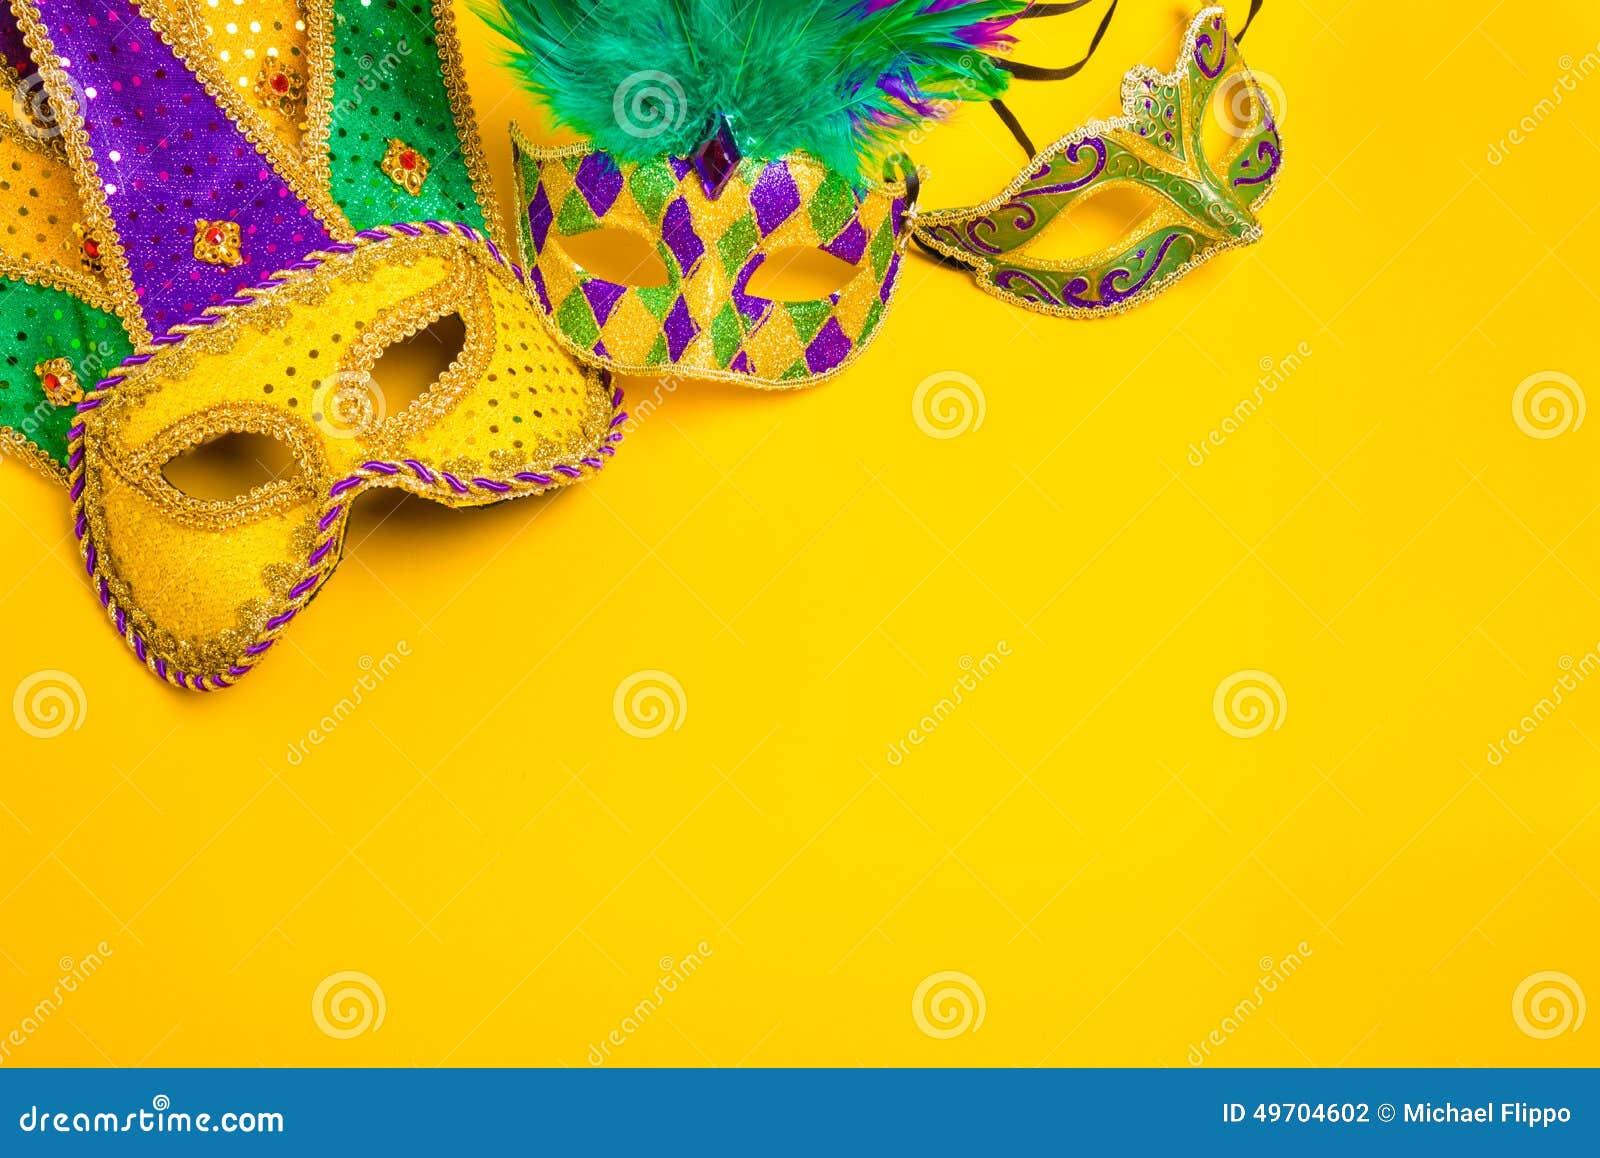 Mardi Gras Mask su fondo giallo